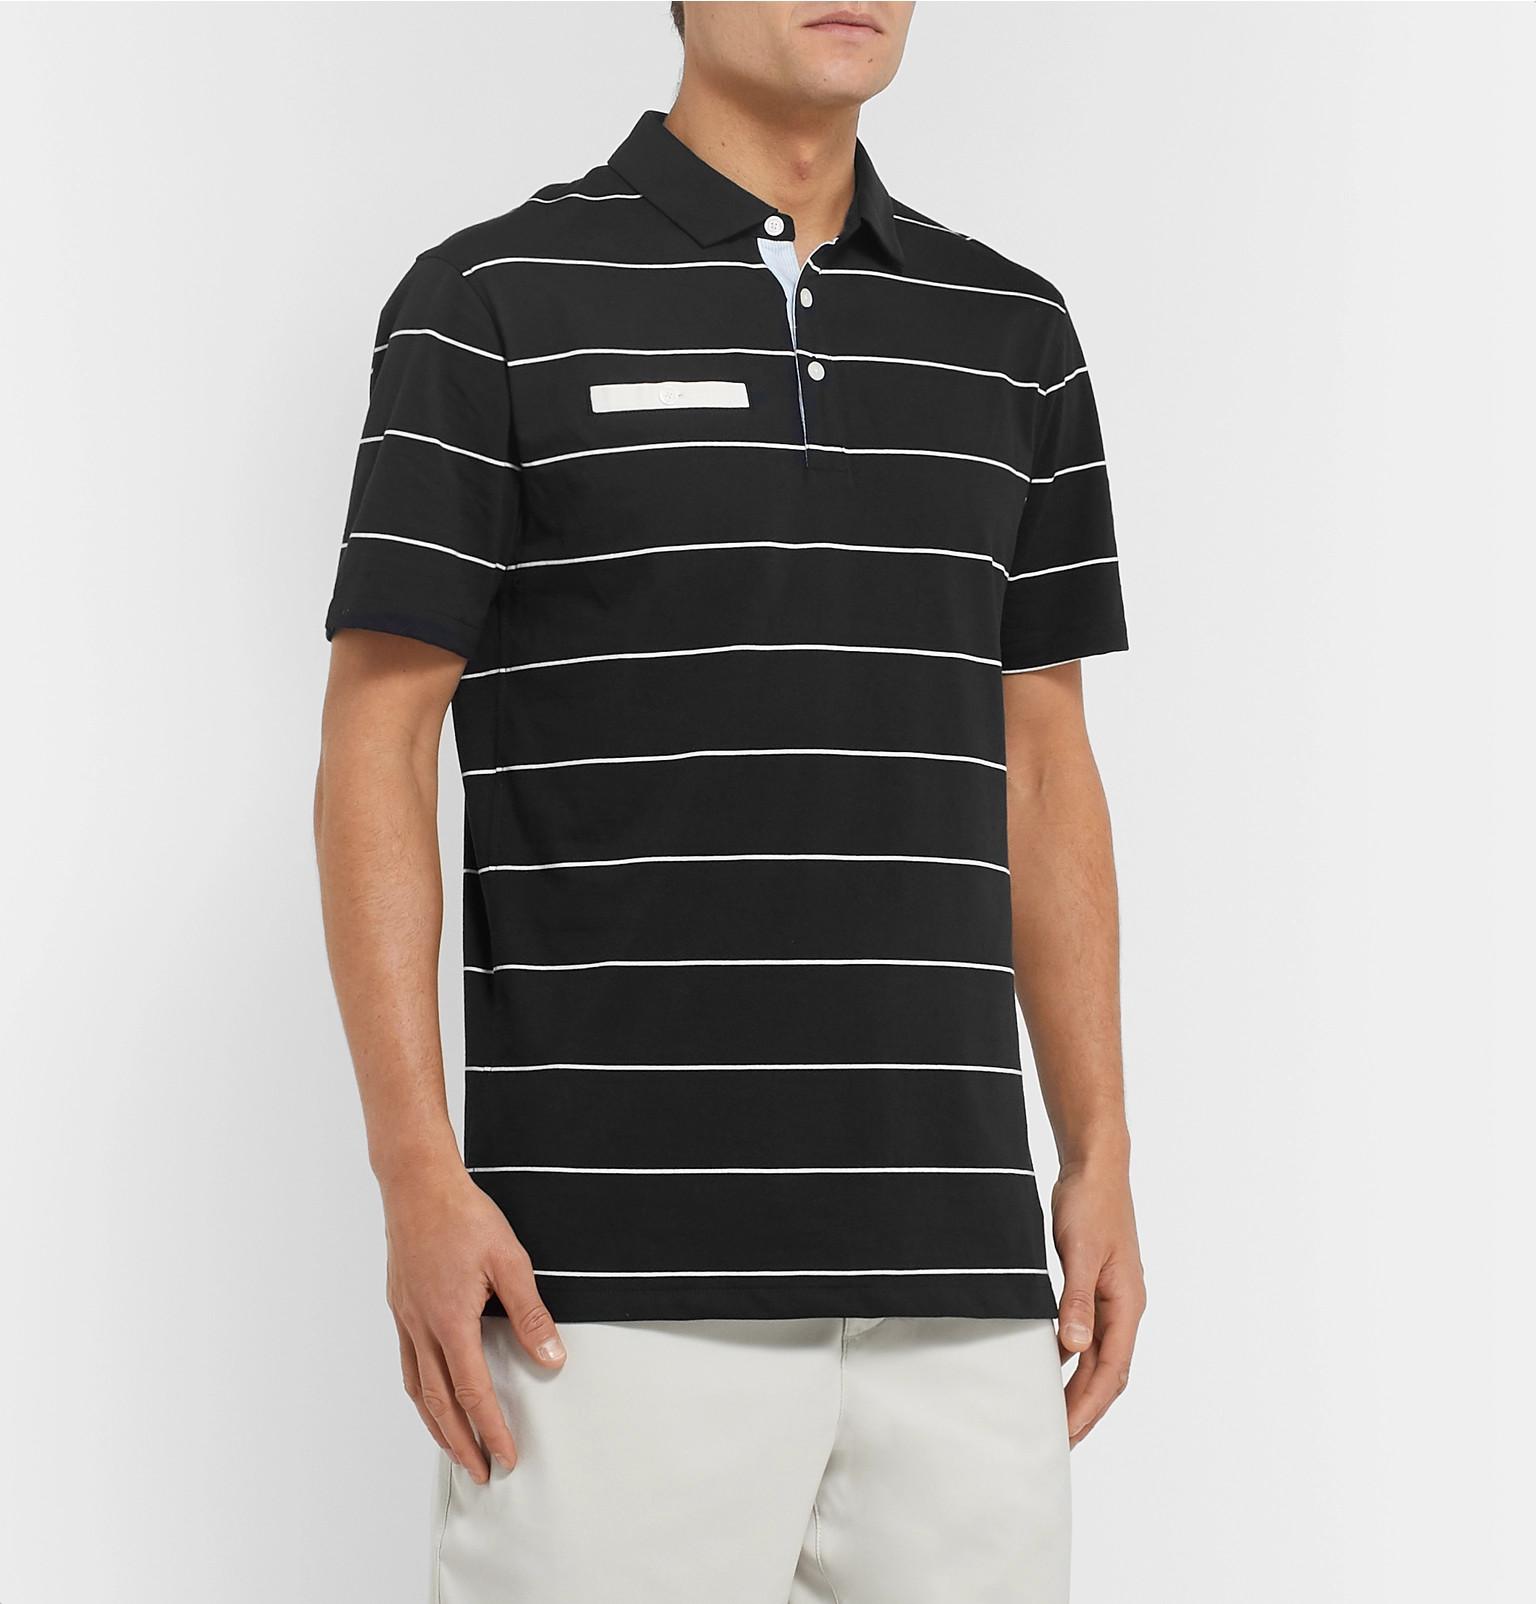 detailed look 0c4a0 a7a73 Nike GolfPlayer Striped Dri-FIT Golf Polo Shirt